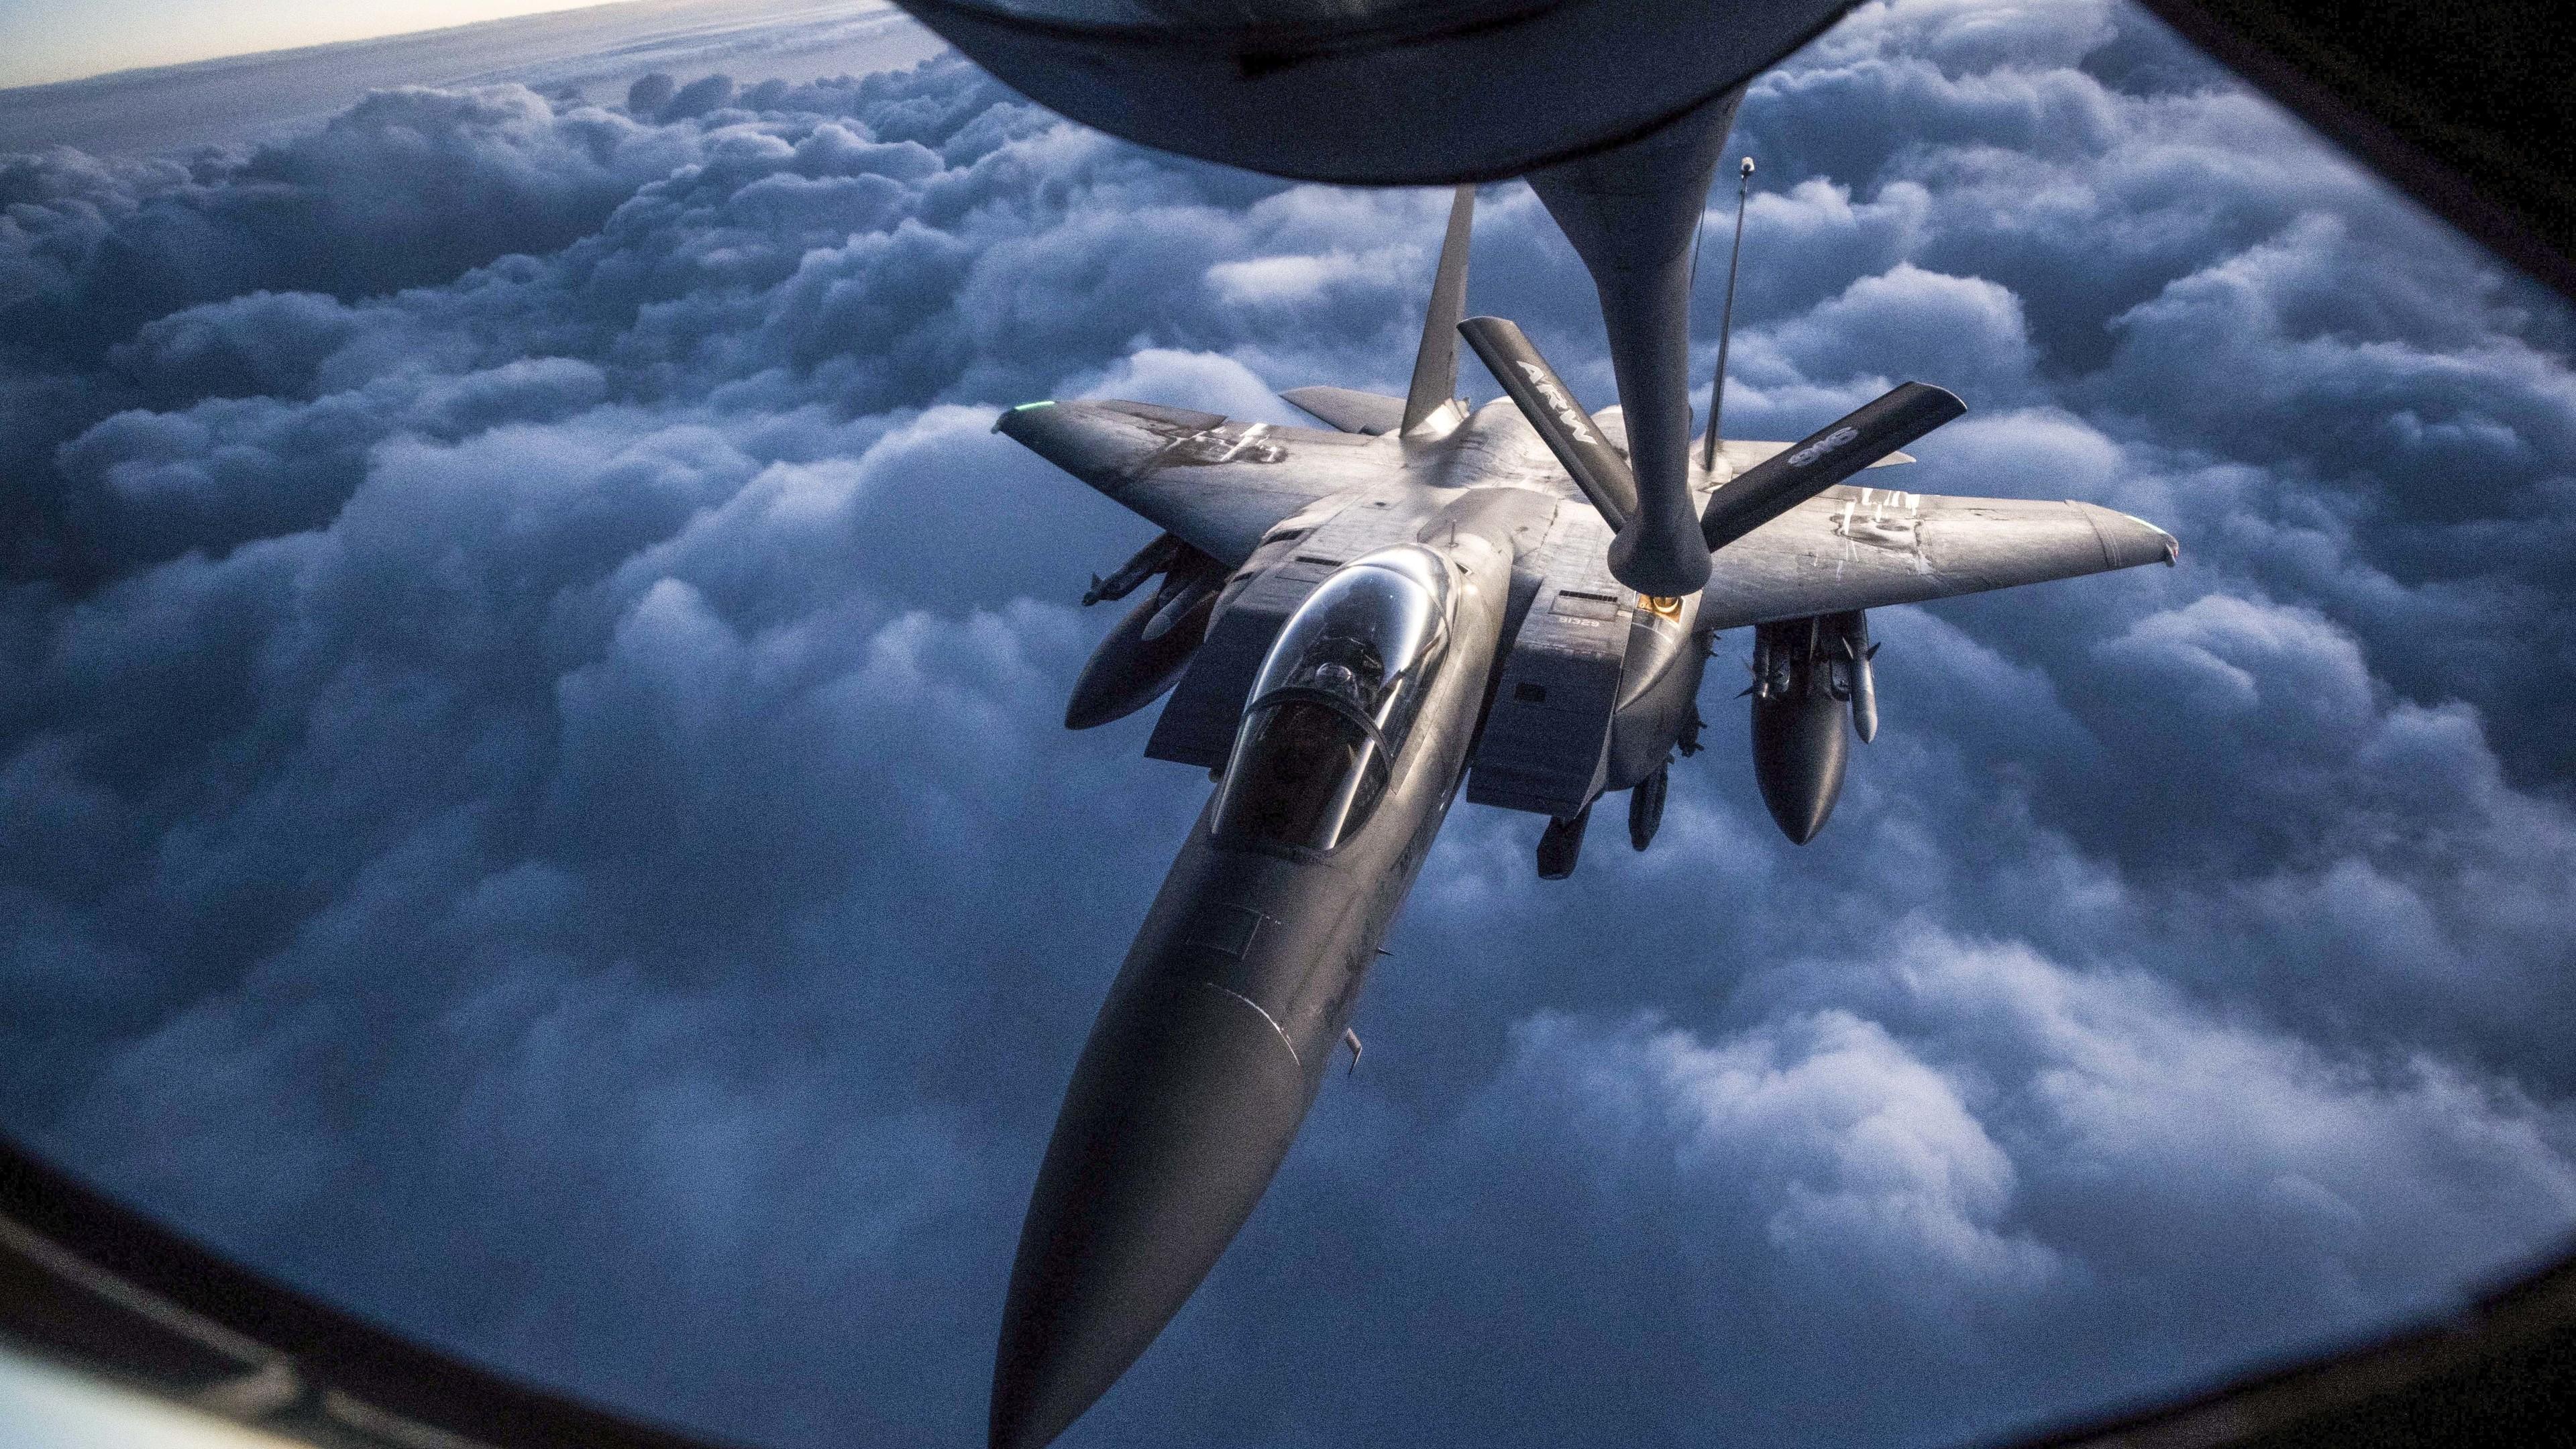 mcdonnell douglas f 15 eagle 4k 1547938002 - McDonnell Douglas F 15 Eagle 4k - planes wallpapers, military wallpapers, hd-wallpapers, airplane wallpapers, 5k wallpapers, 4k-wallpapers